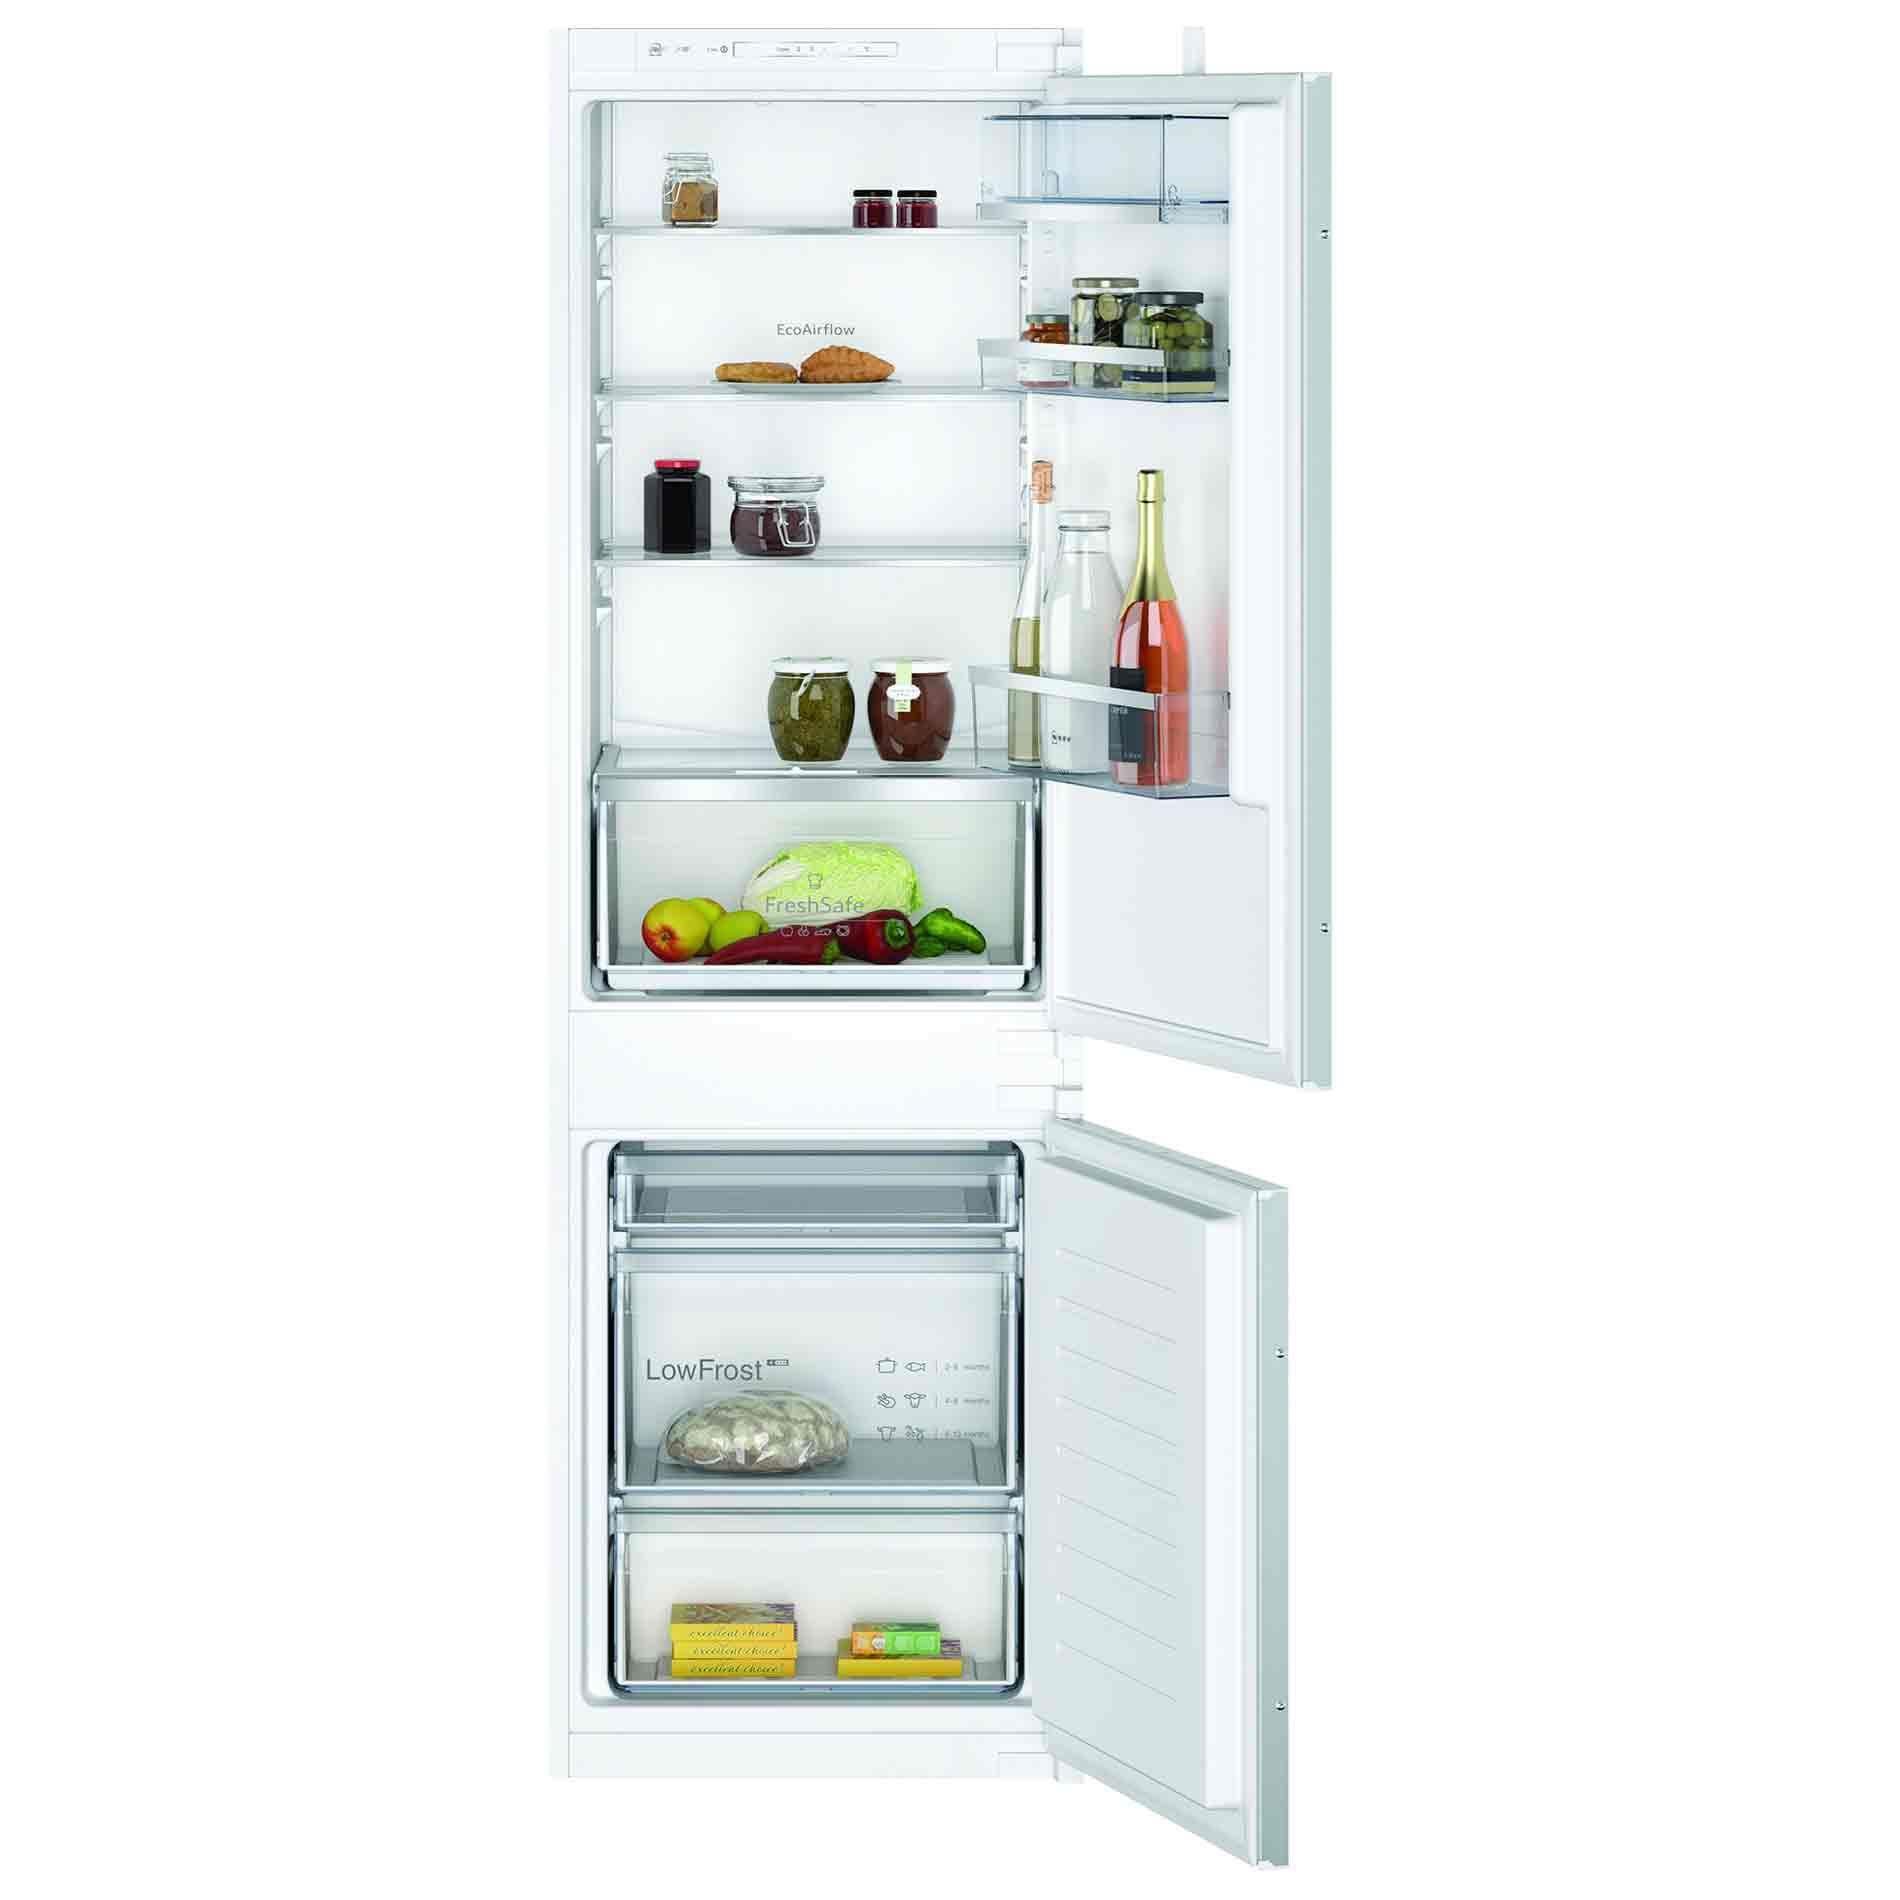 Picture of KI5862SE0G 60-40 Built-in Fridge Freezer